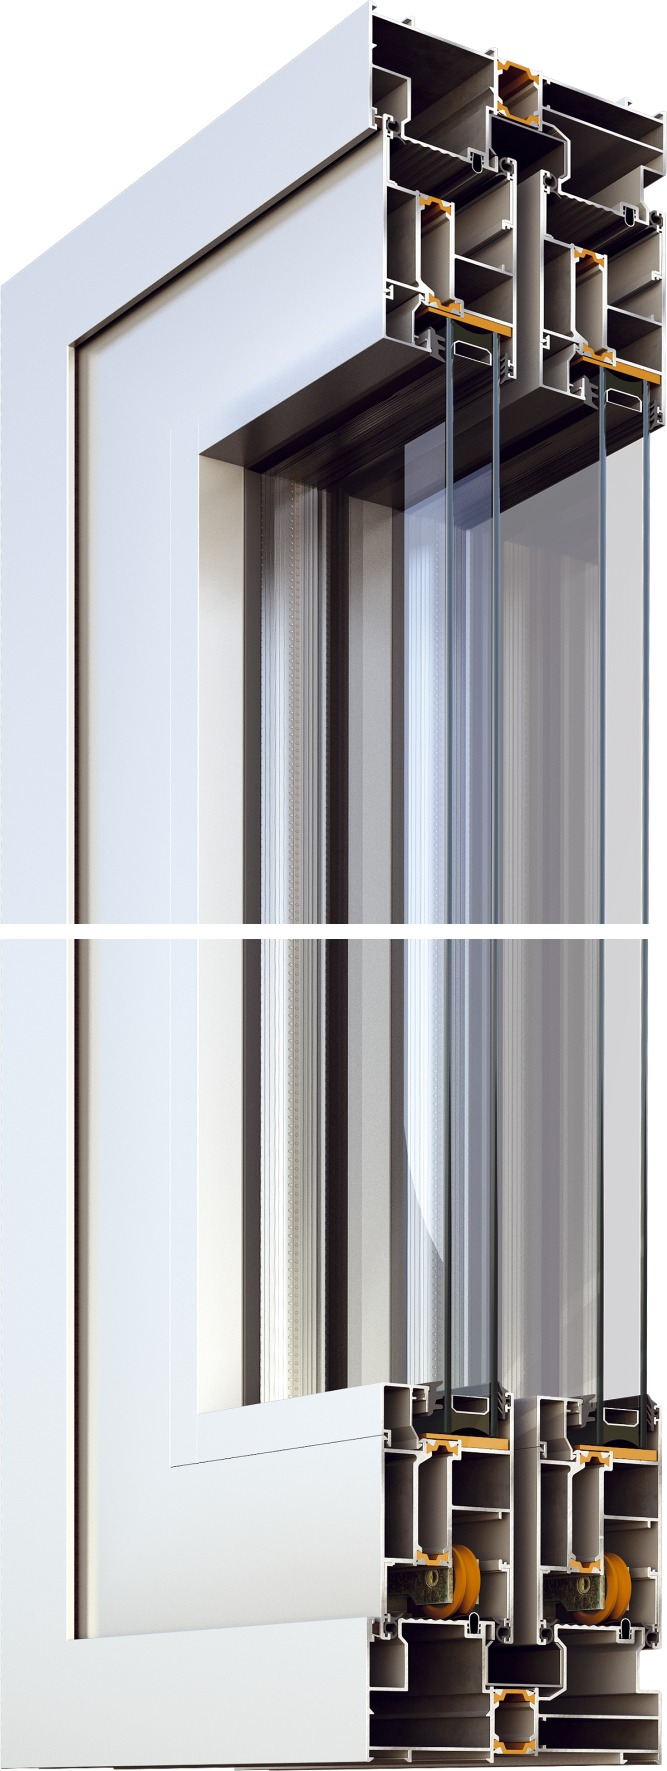 ARCH 2011 EnDe M300 2